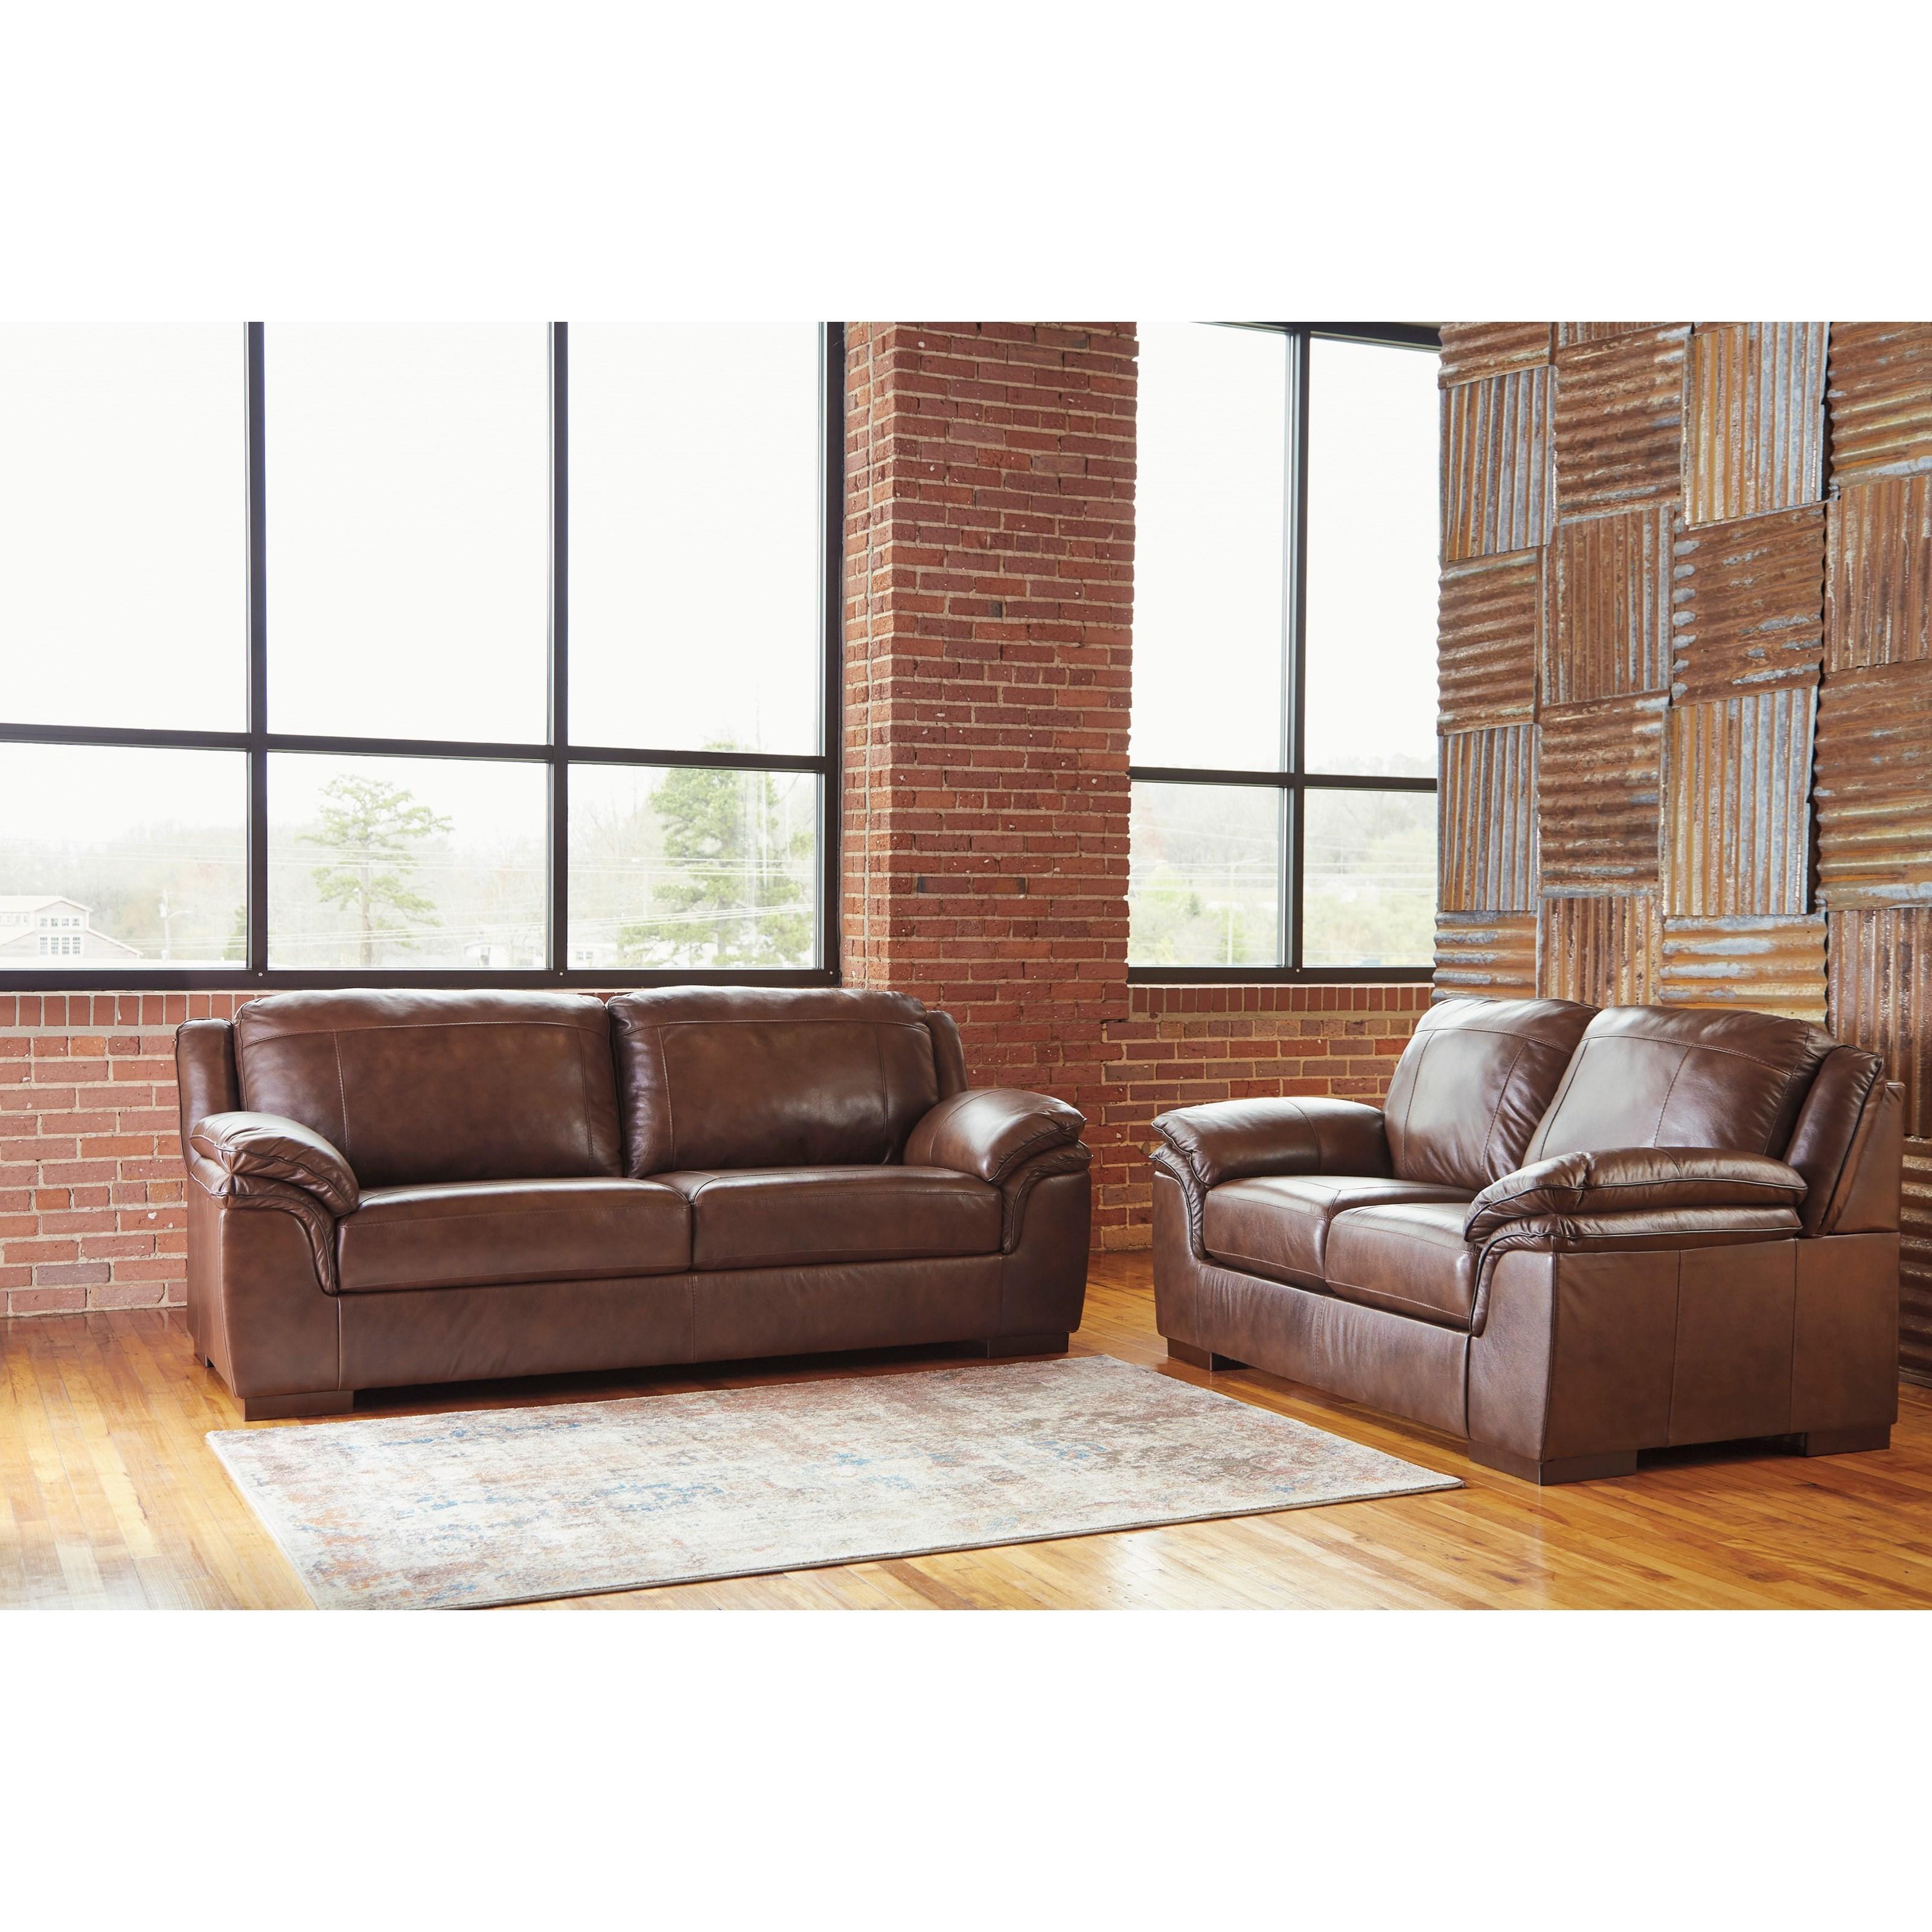 Ashley Furniture Living Room: Signature Design By Ashley Islebrook Stationary Living